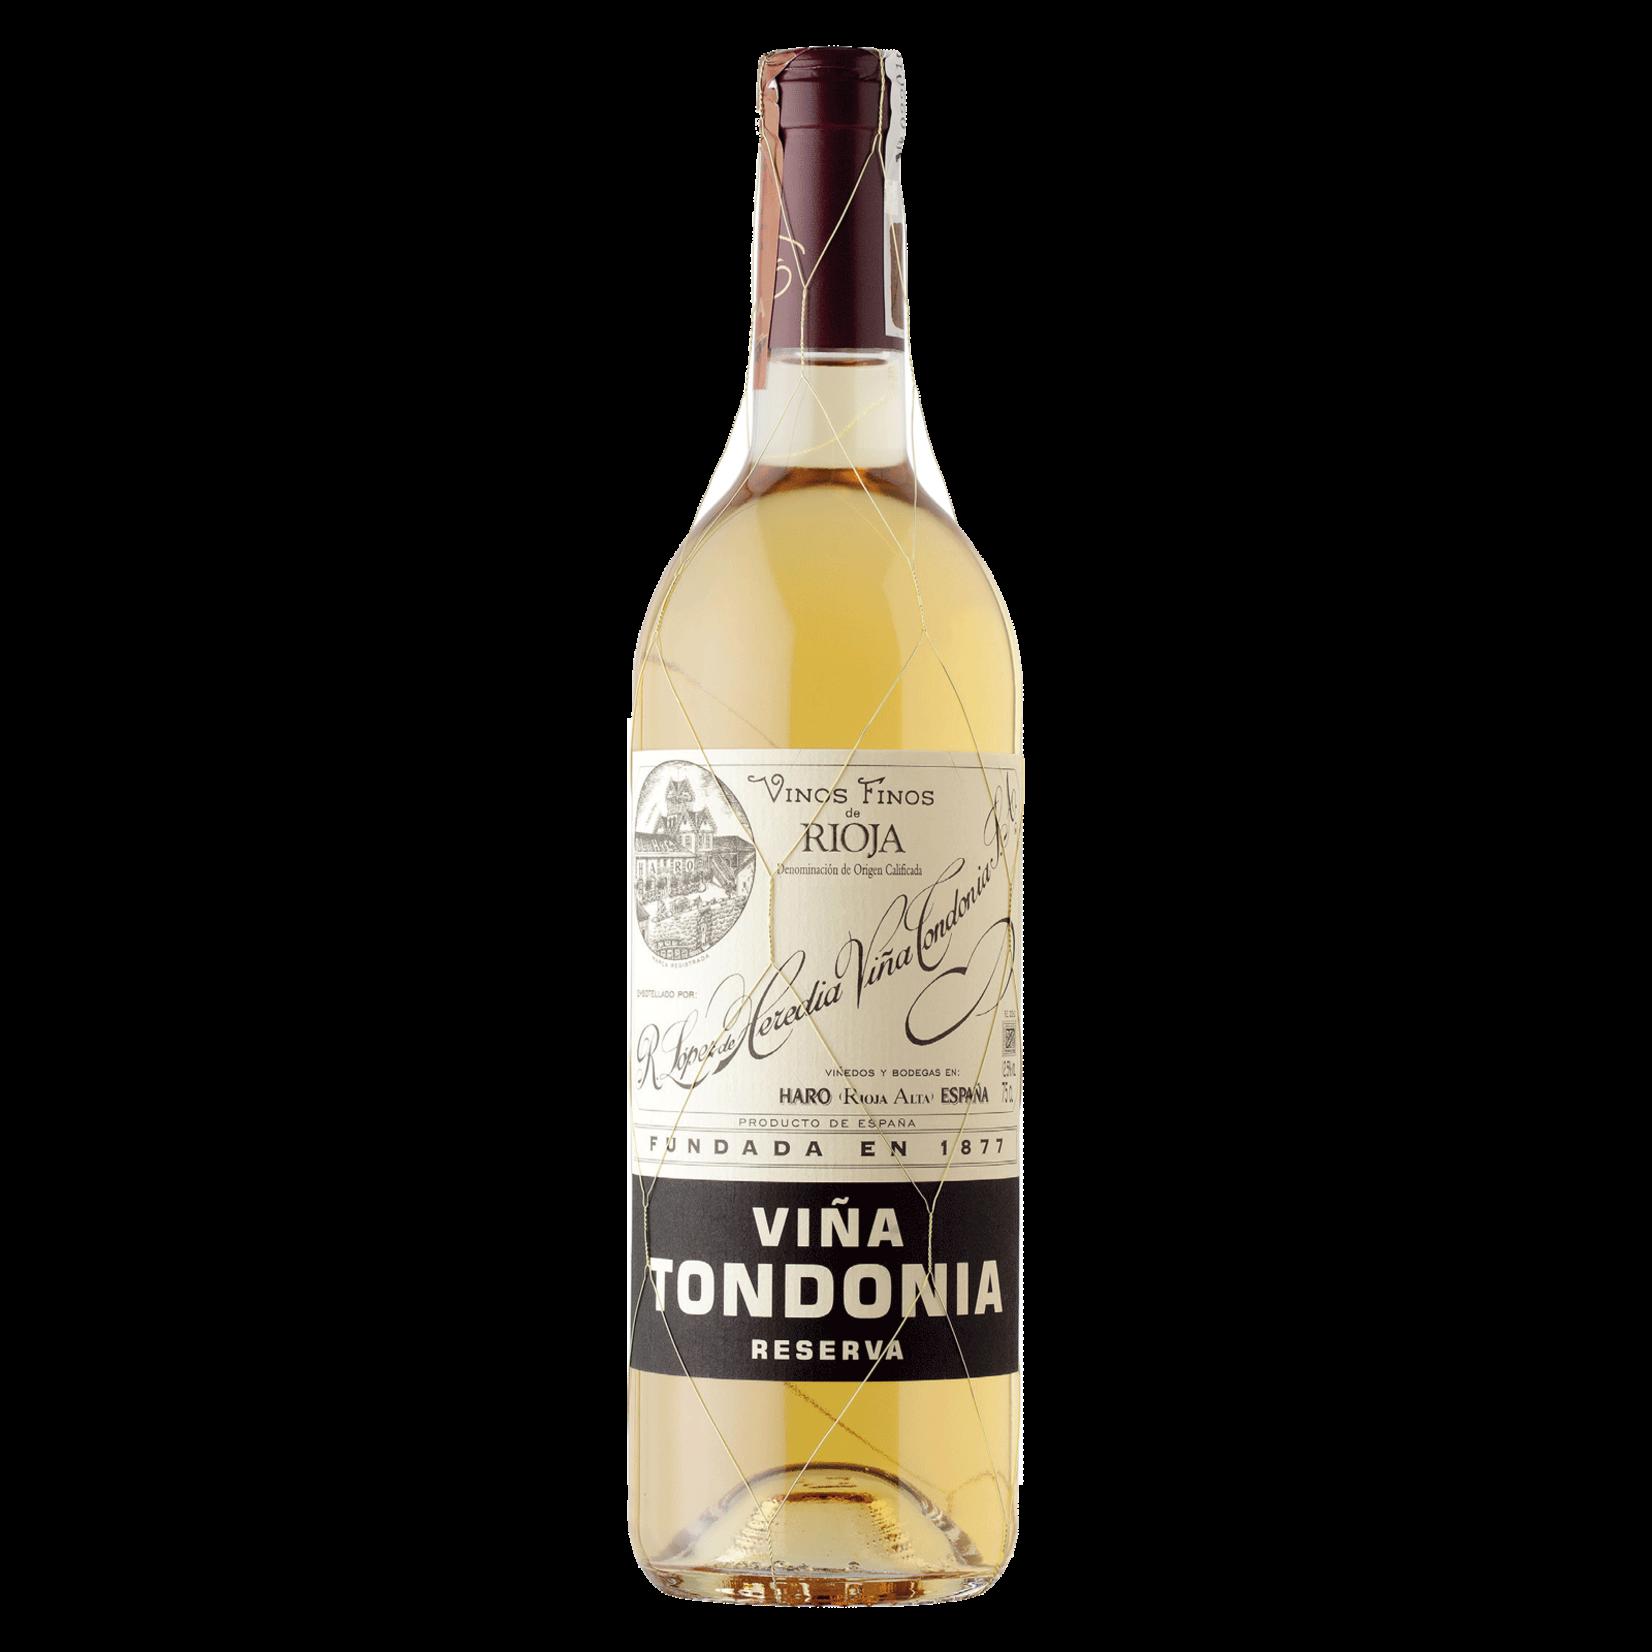 Wine Lopez de Heredia Tondonia Reserva White 2009